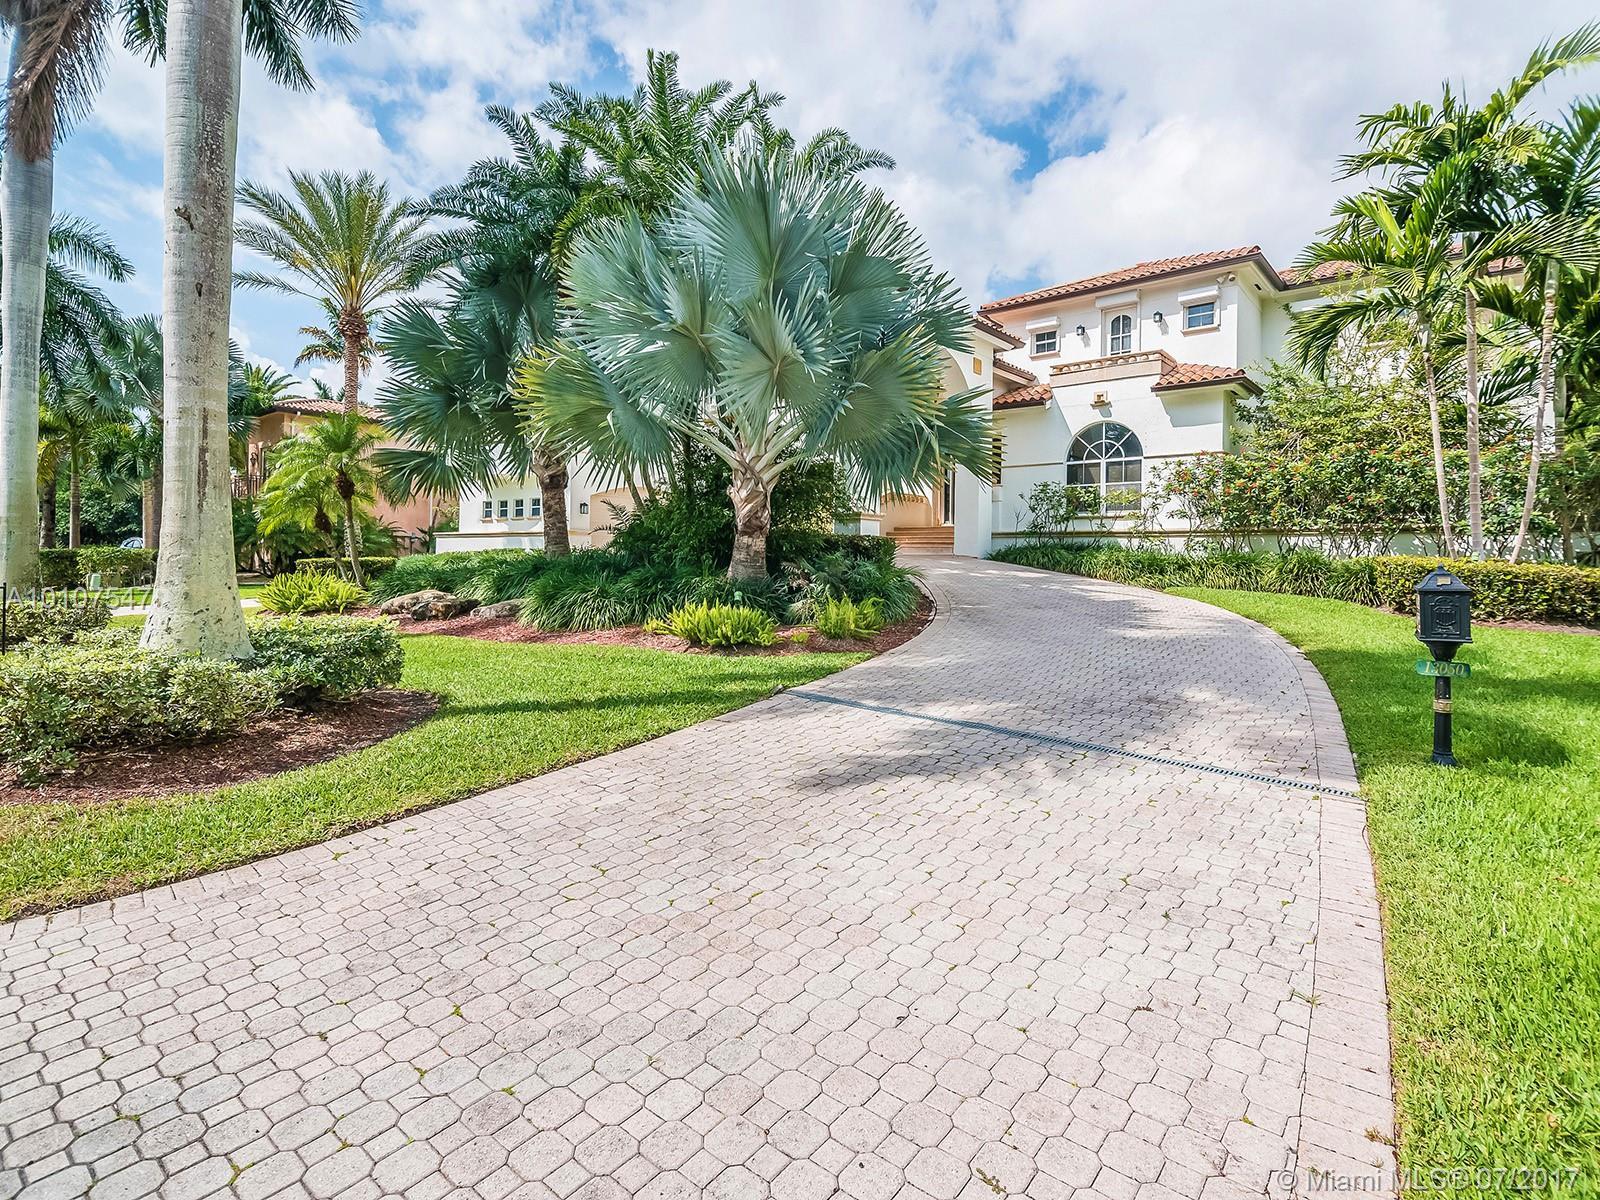 13050 MAR ST - Coral Gables, Florida